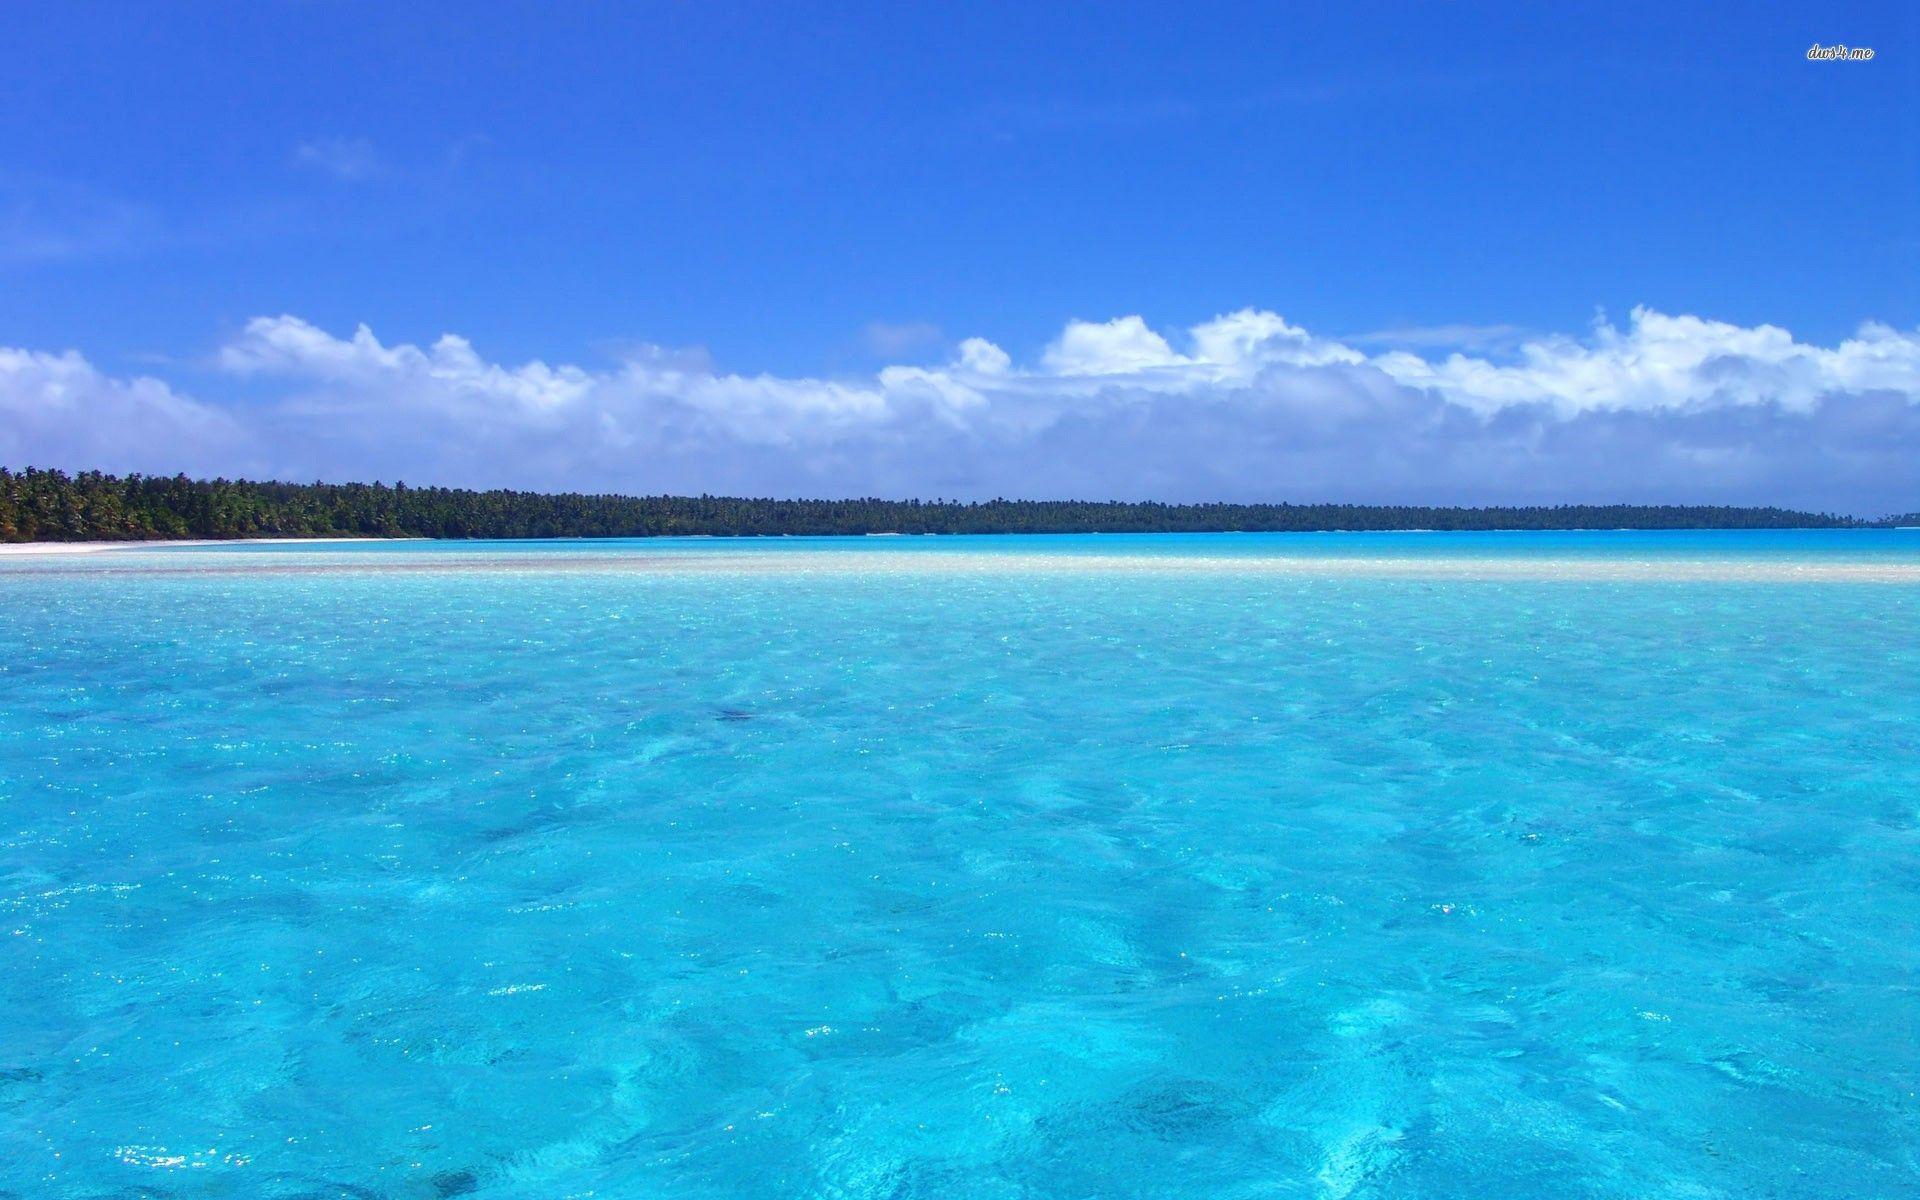 Clear Blue Ocean Cute Wallpaper Hd Wallpaper Ocean Landscape Ocean Pictures Ocean Wallpaper